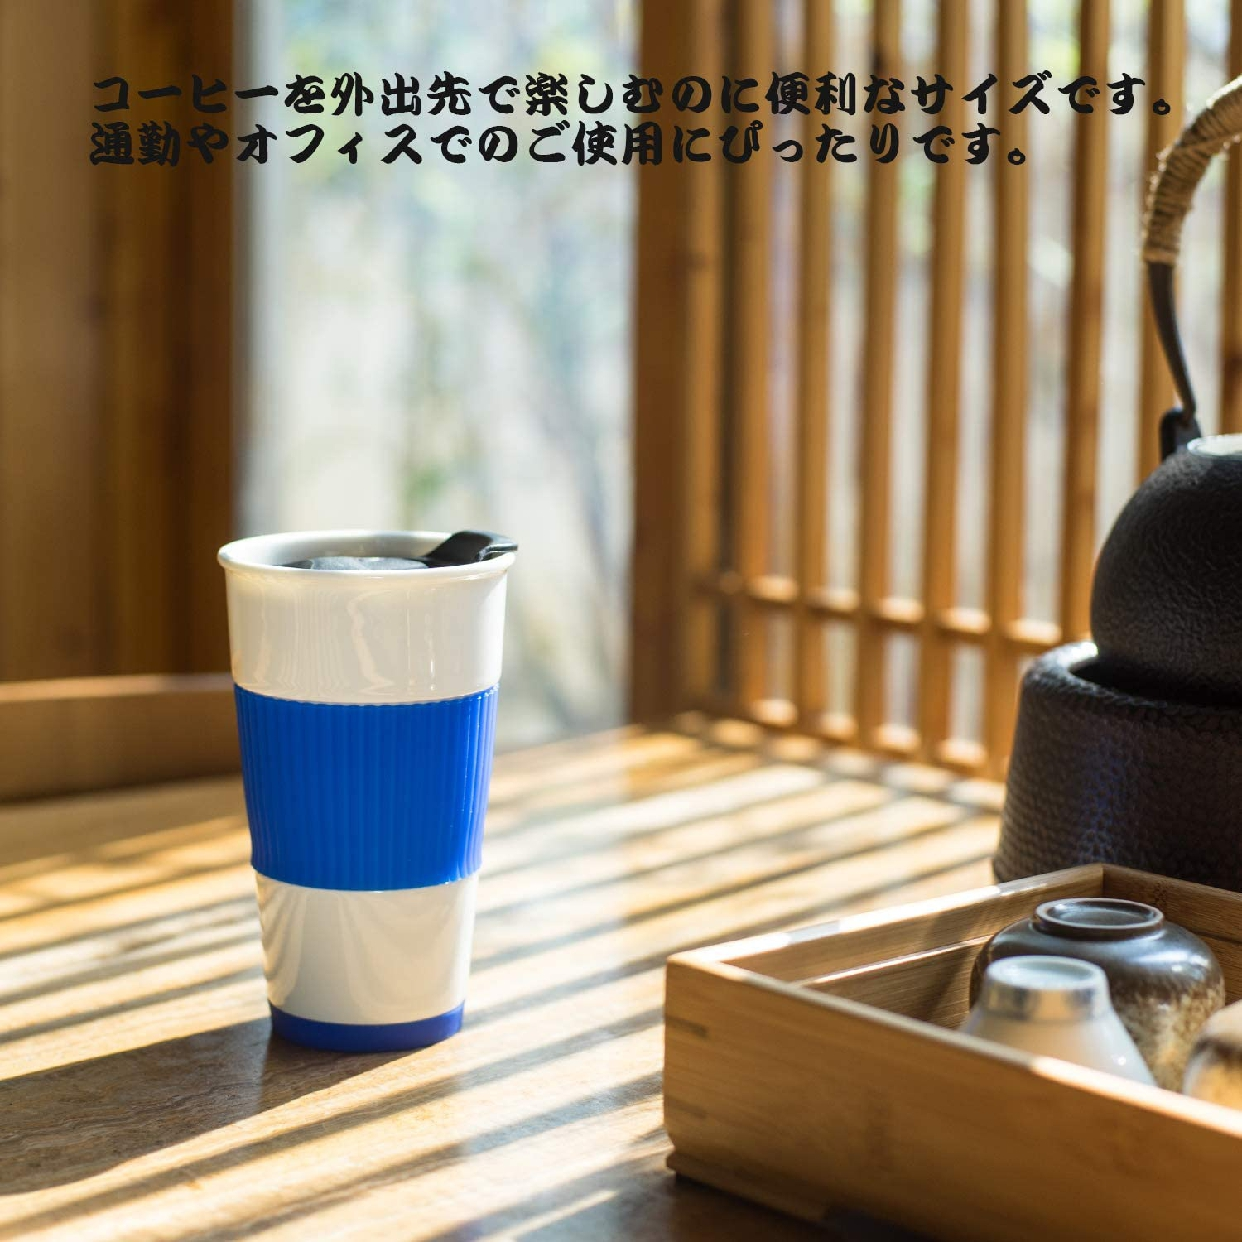 UDMG(ユーディーエムジー) 二重構造断熱コーヒーカップの商品画像5